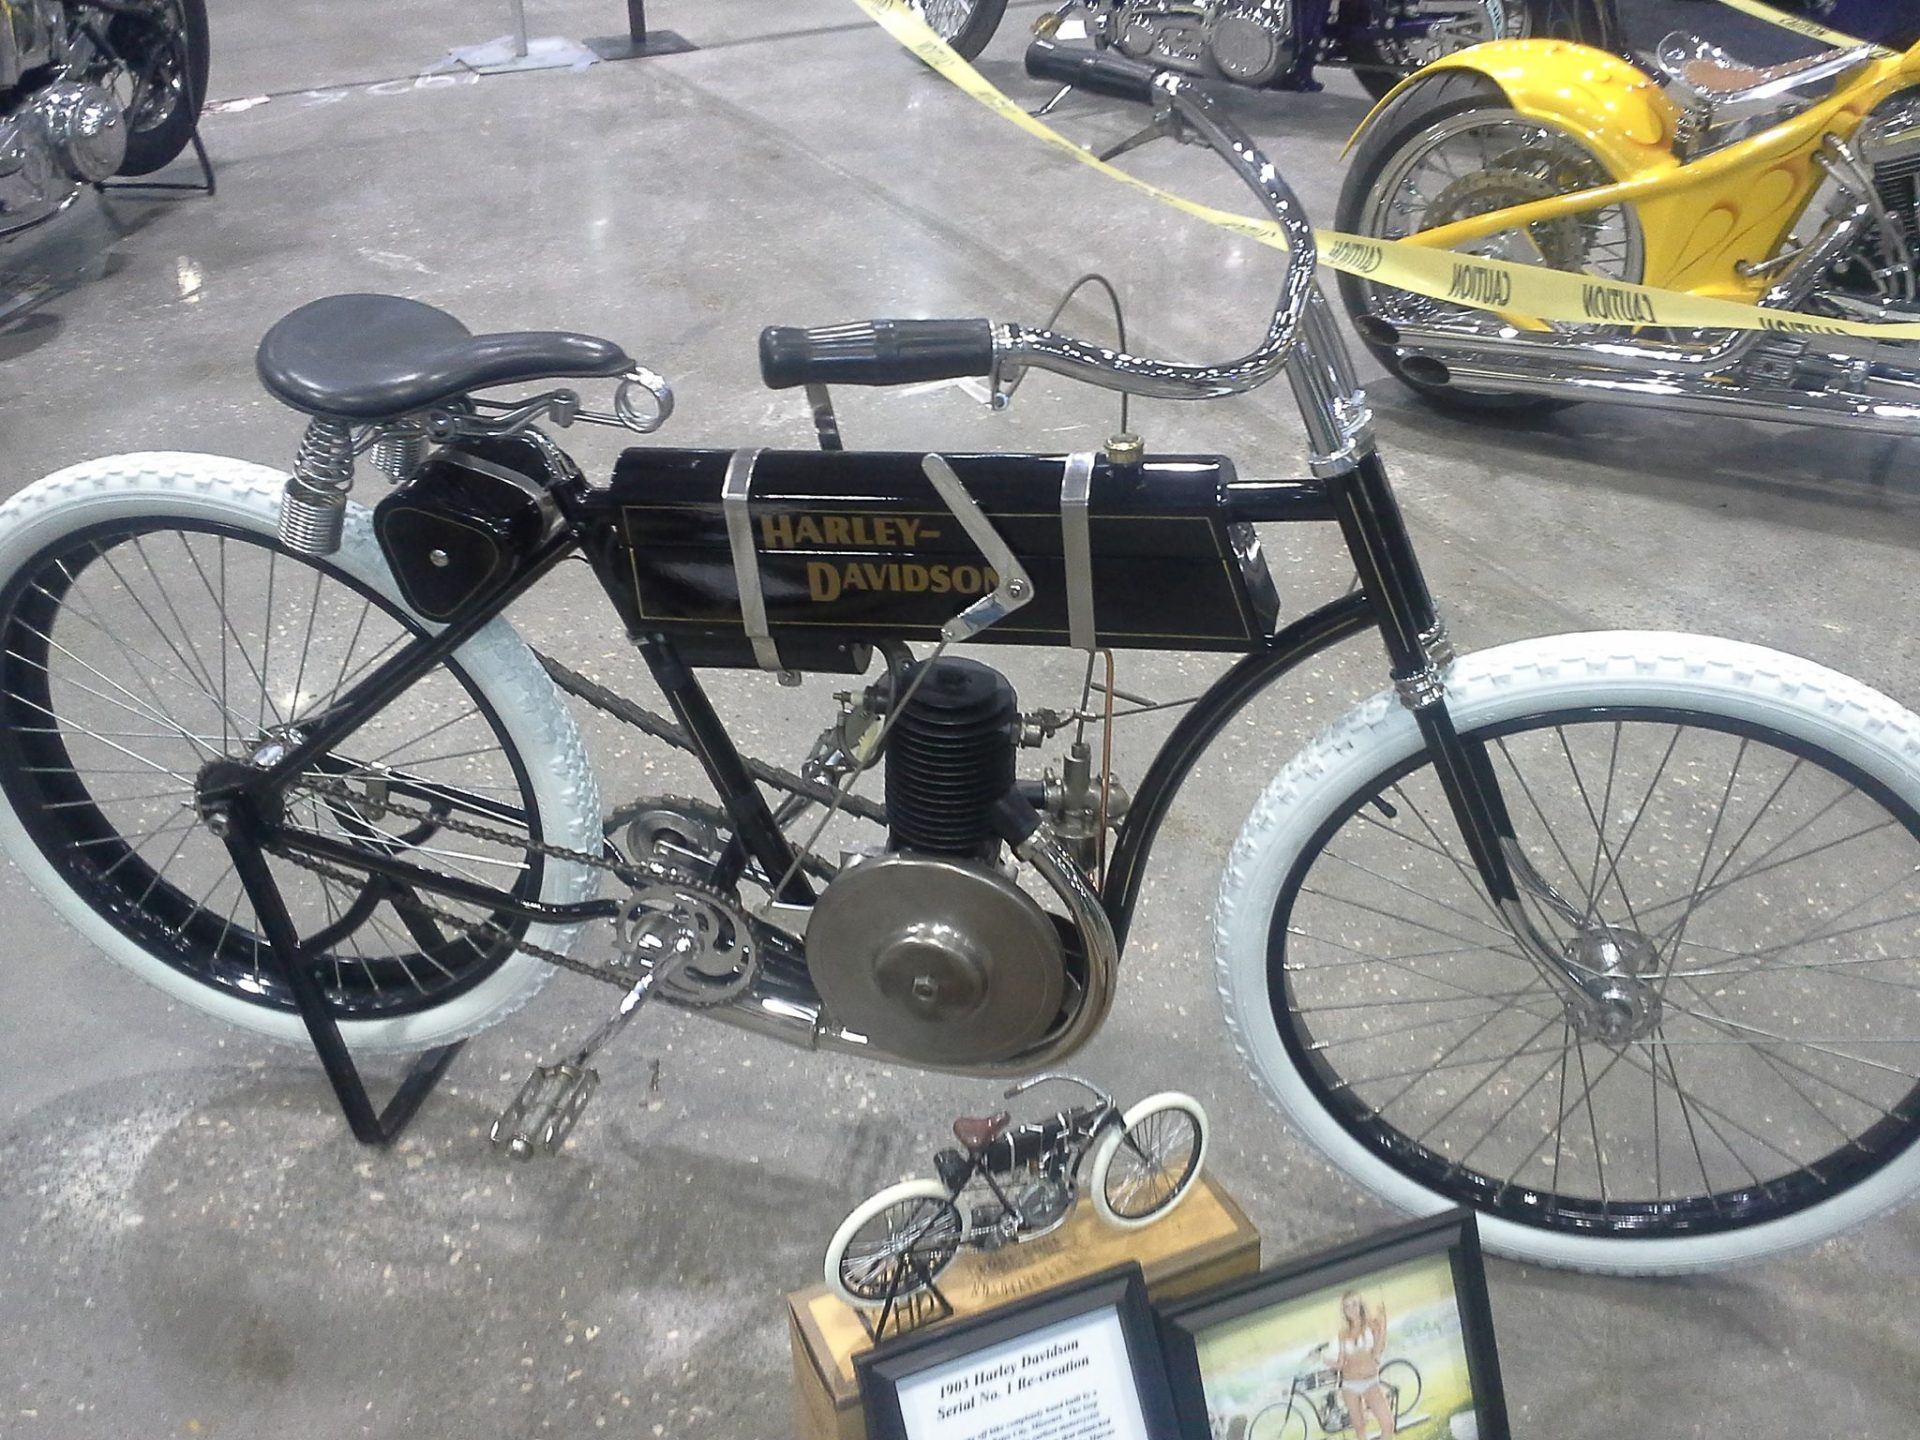 Harley Davidson, Bikes, Documentary